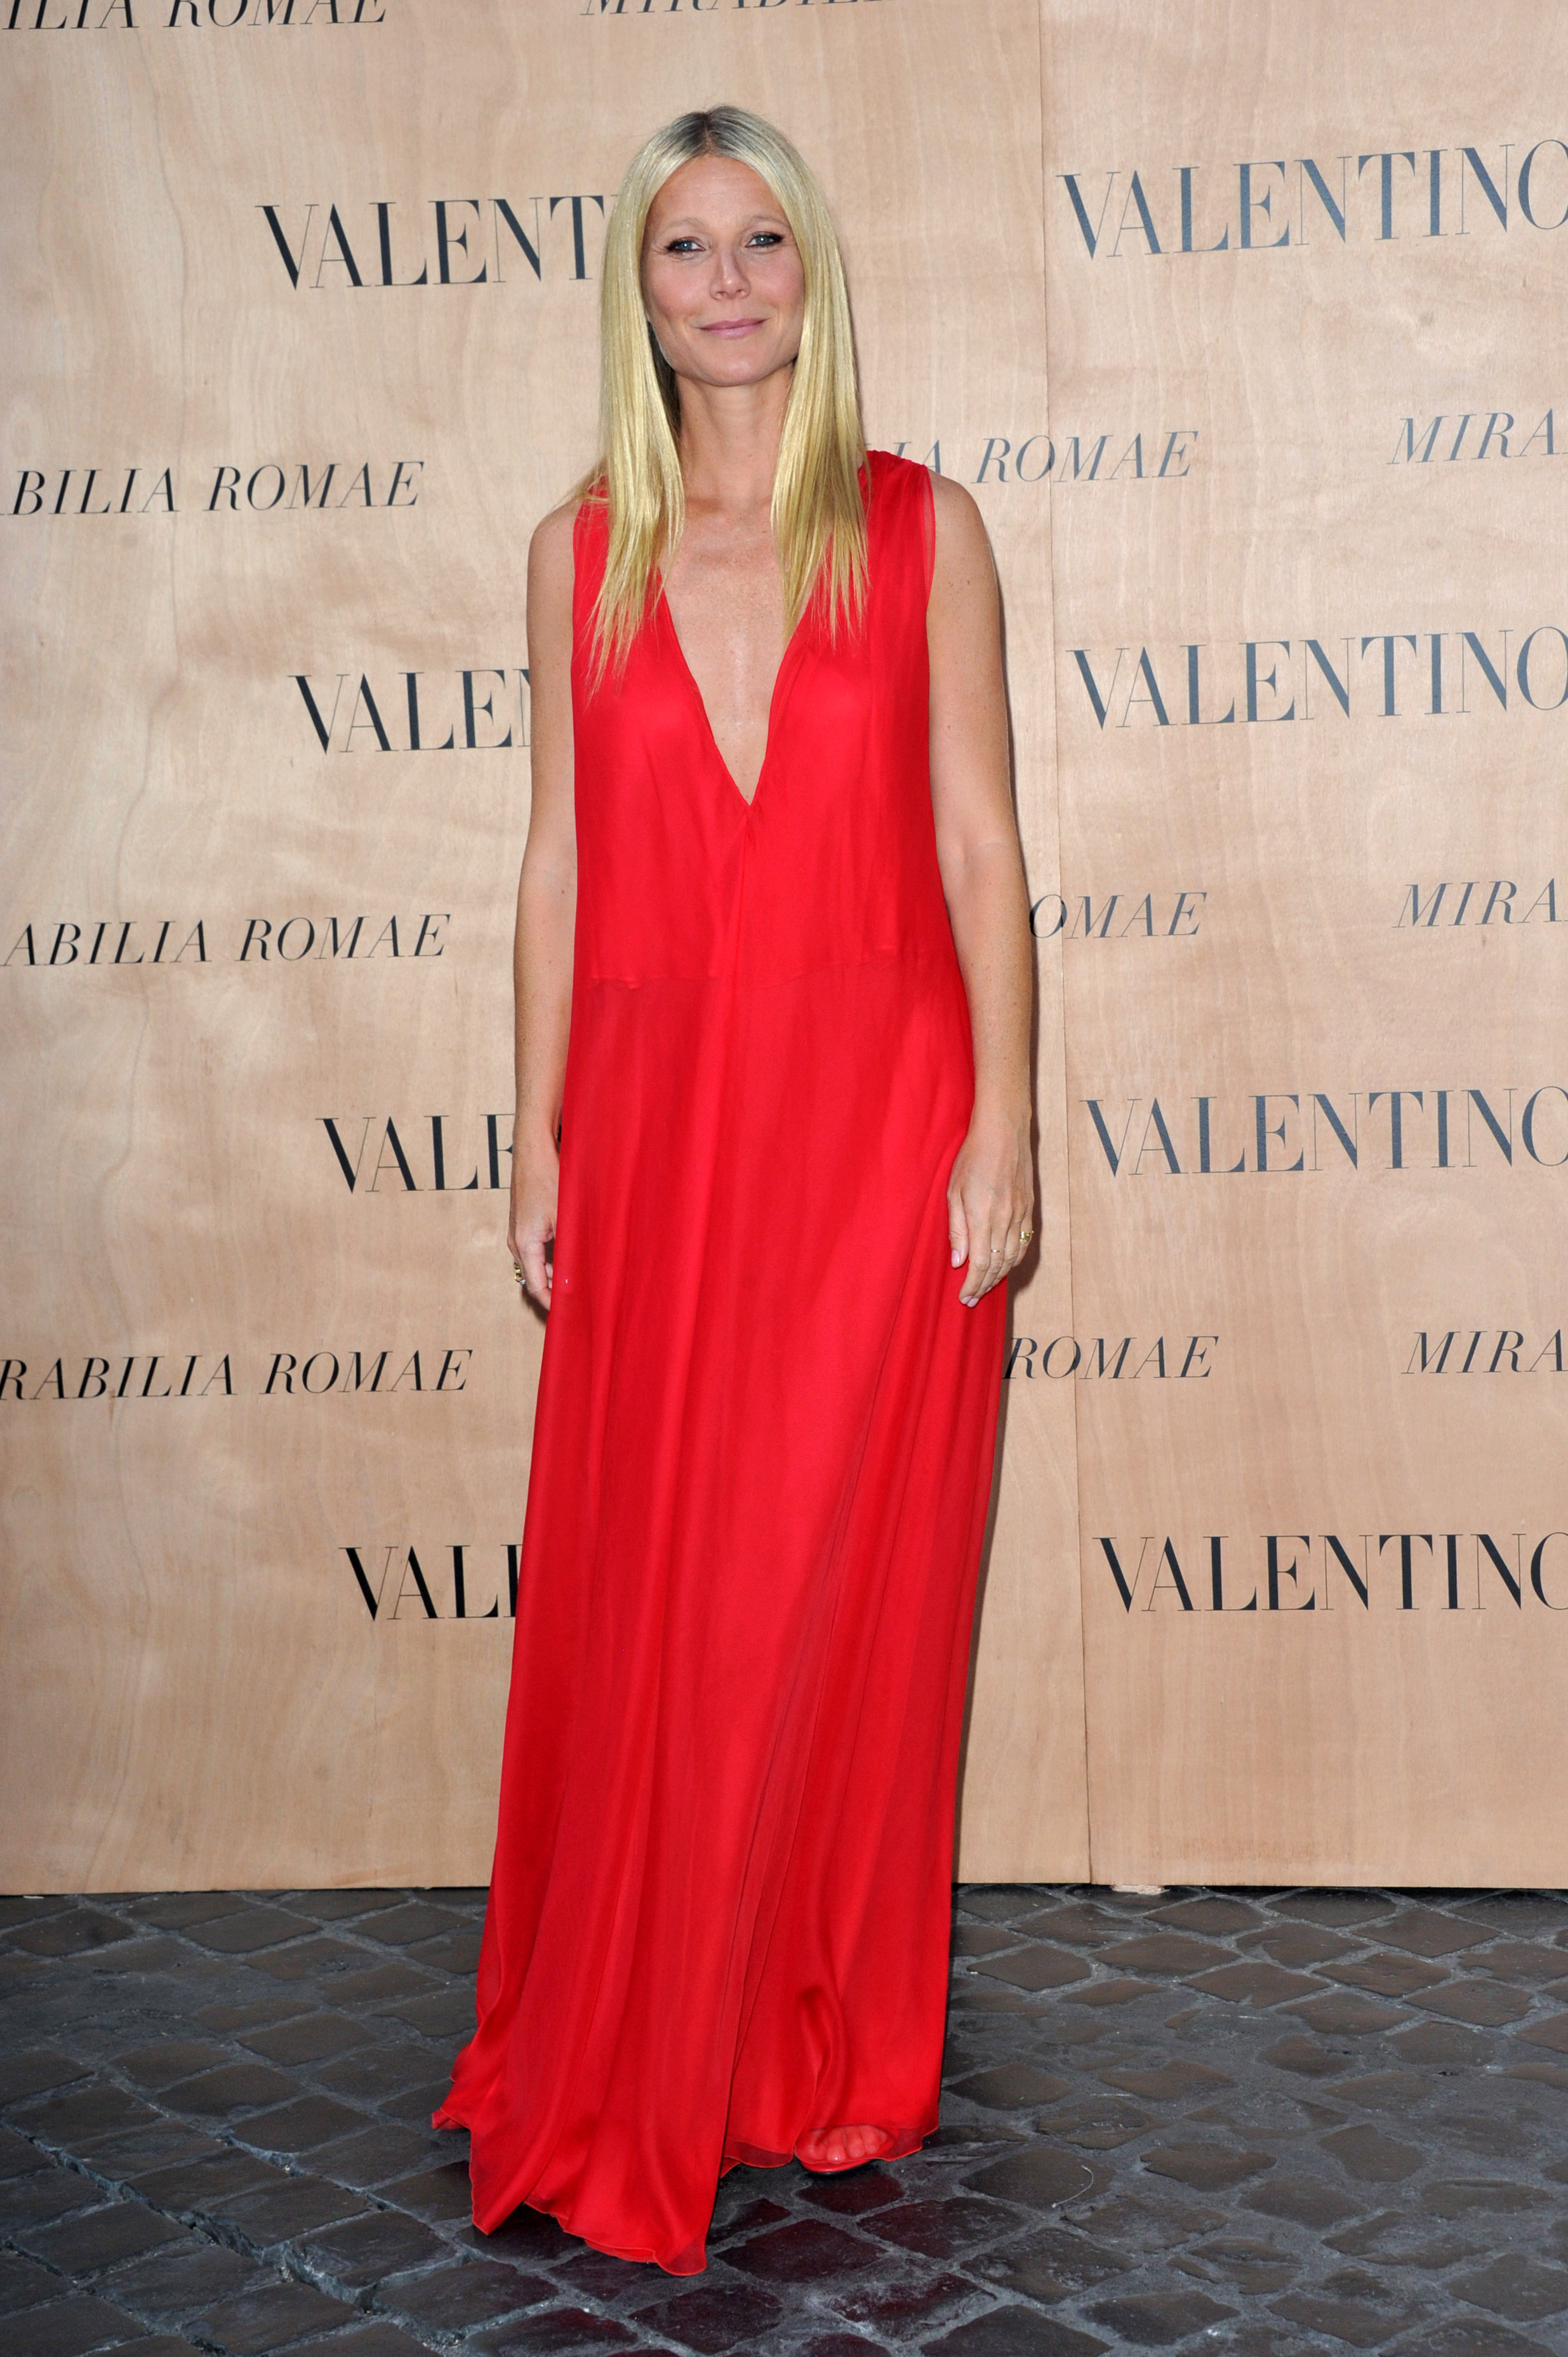 Gwyneth Paltrow on her biggest skincare misstep: